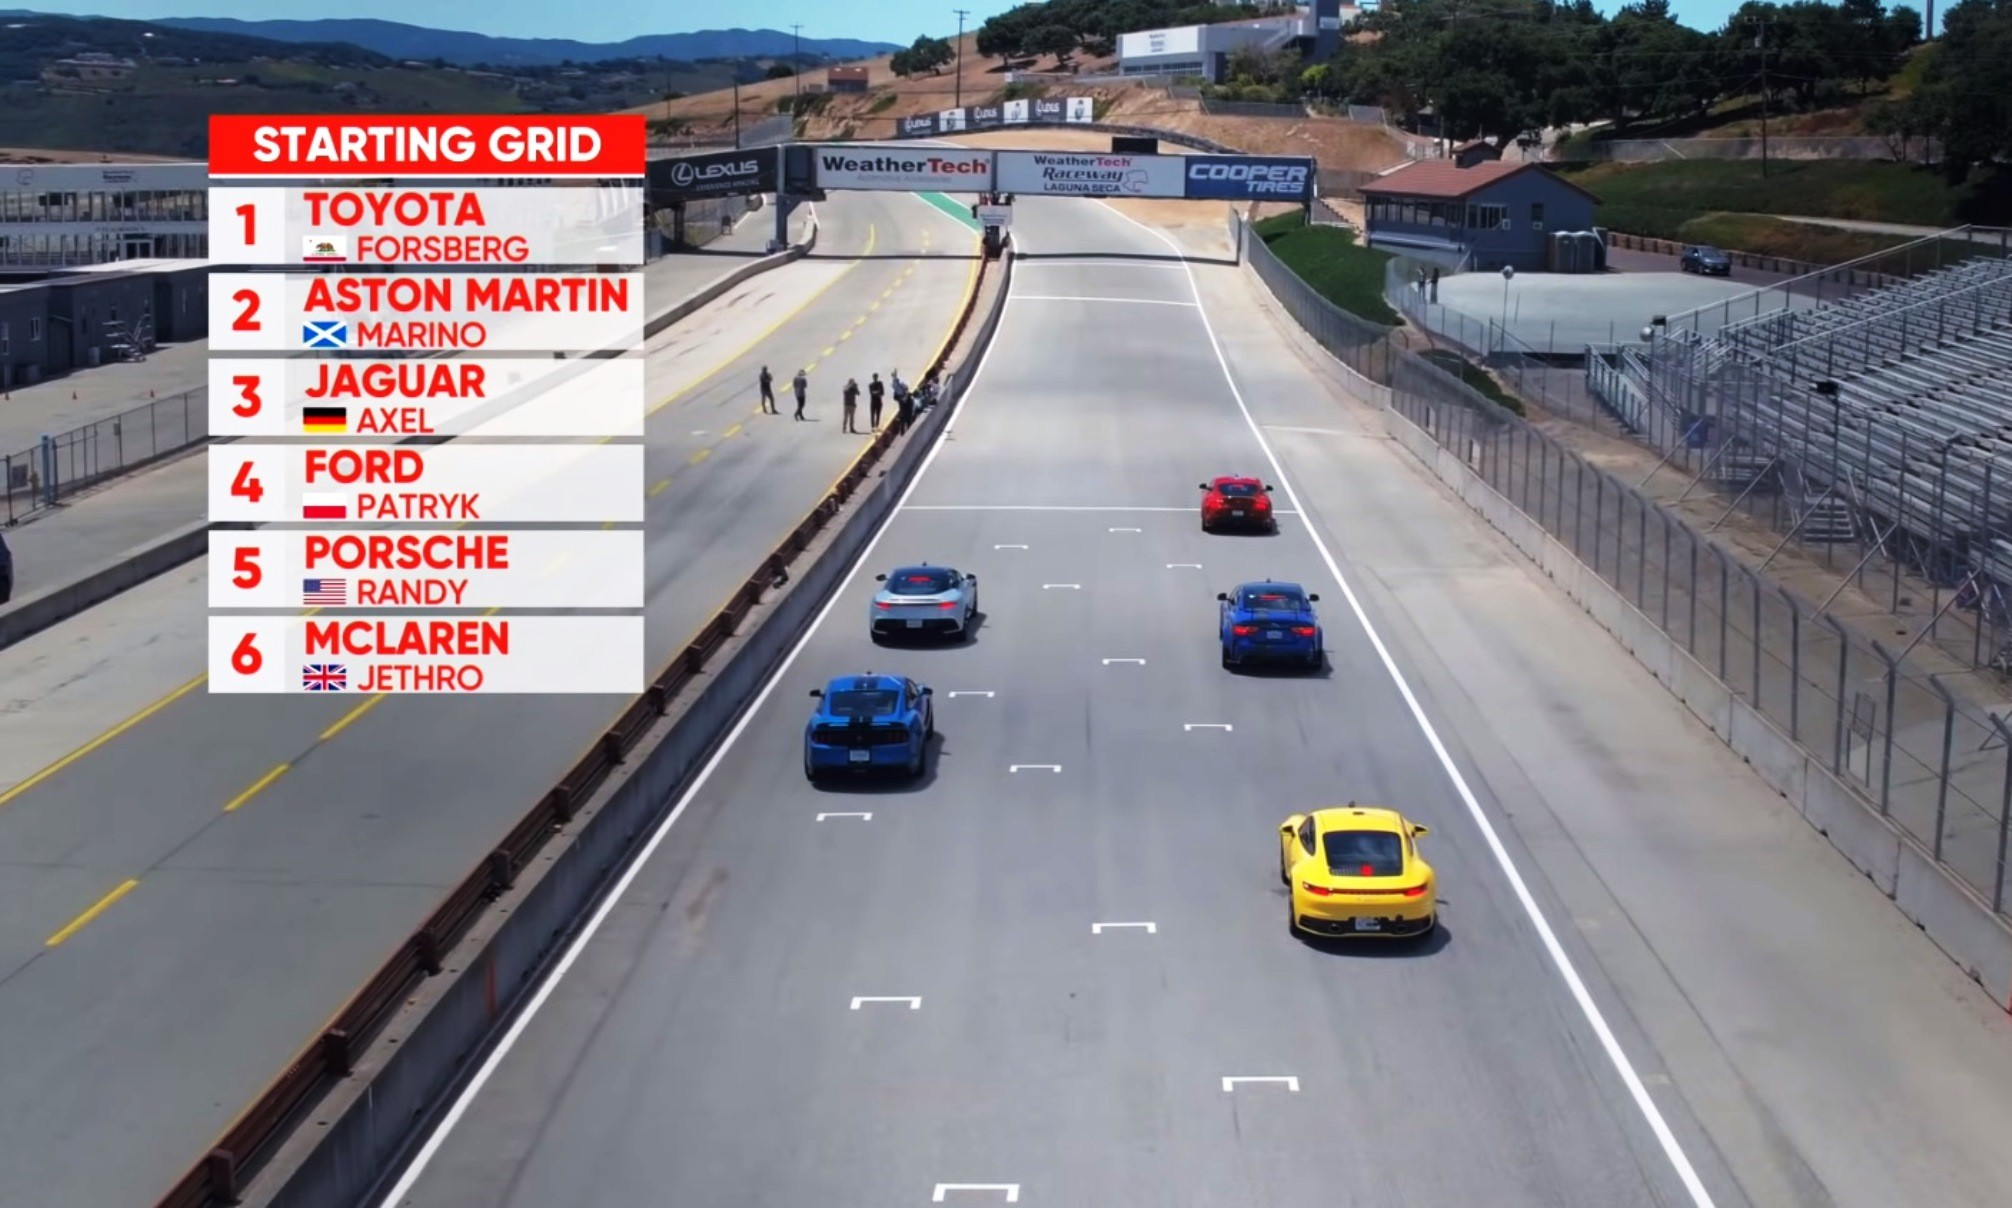 Best Driver's Car GP grid